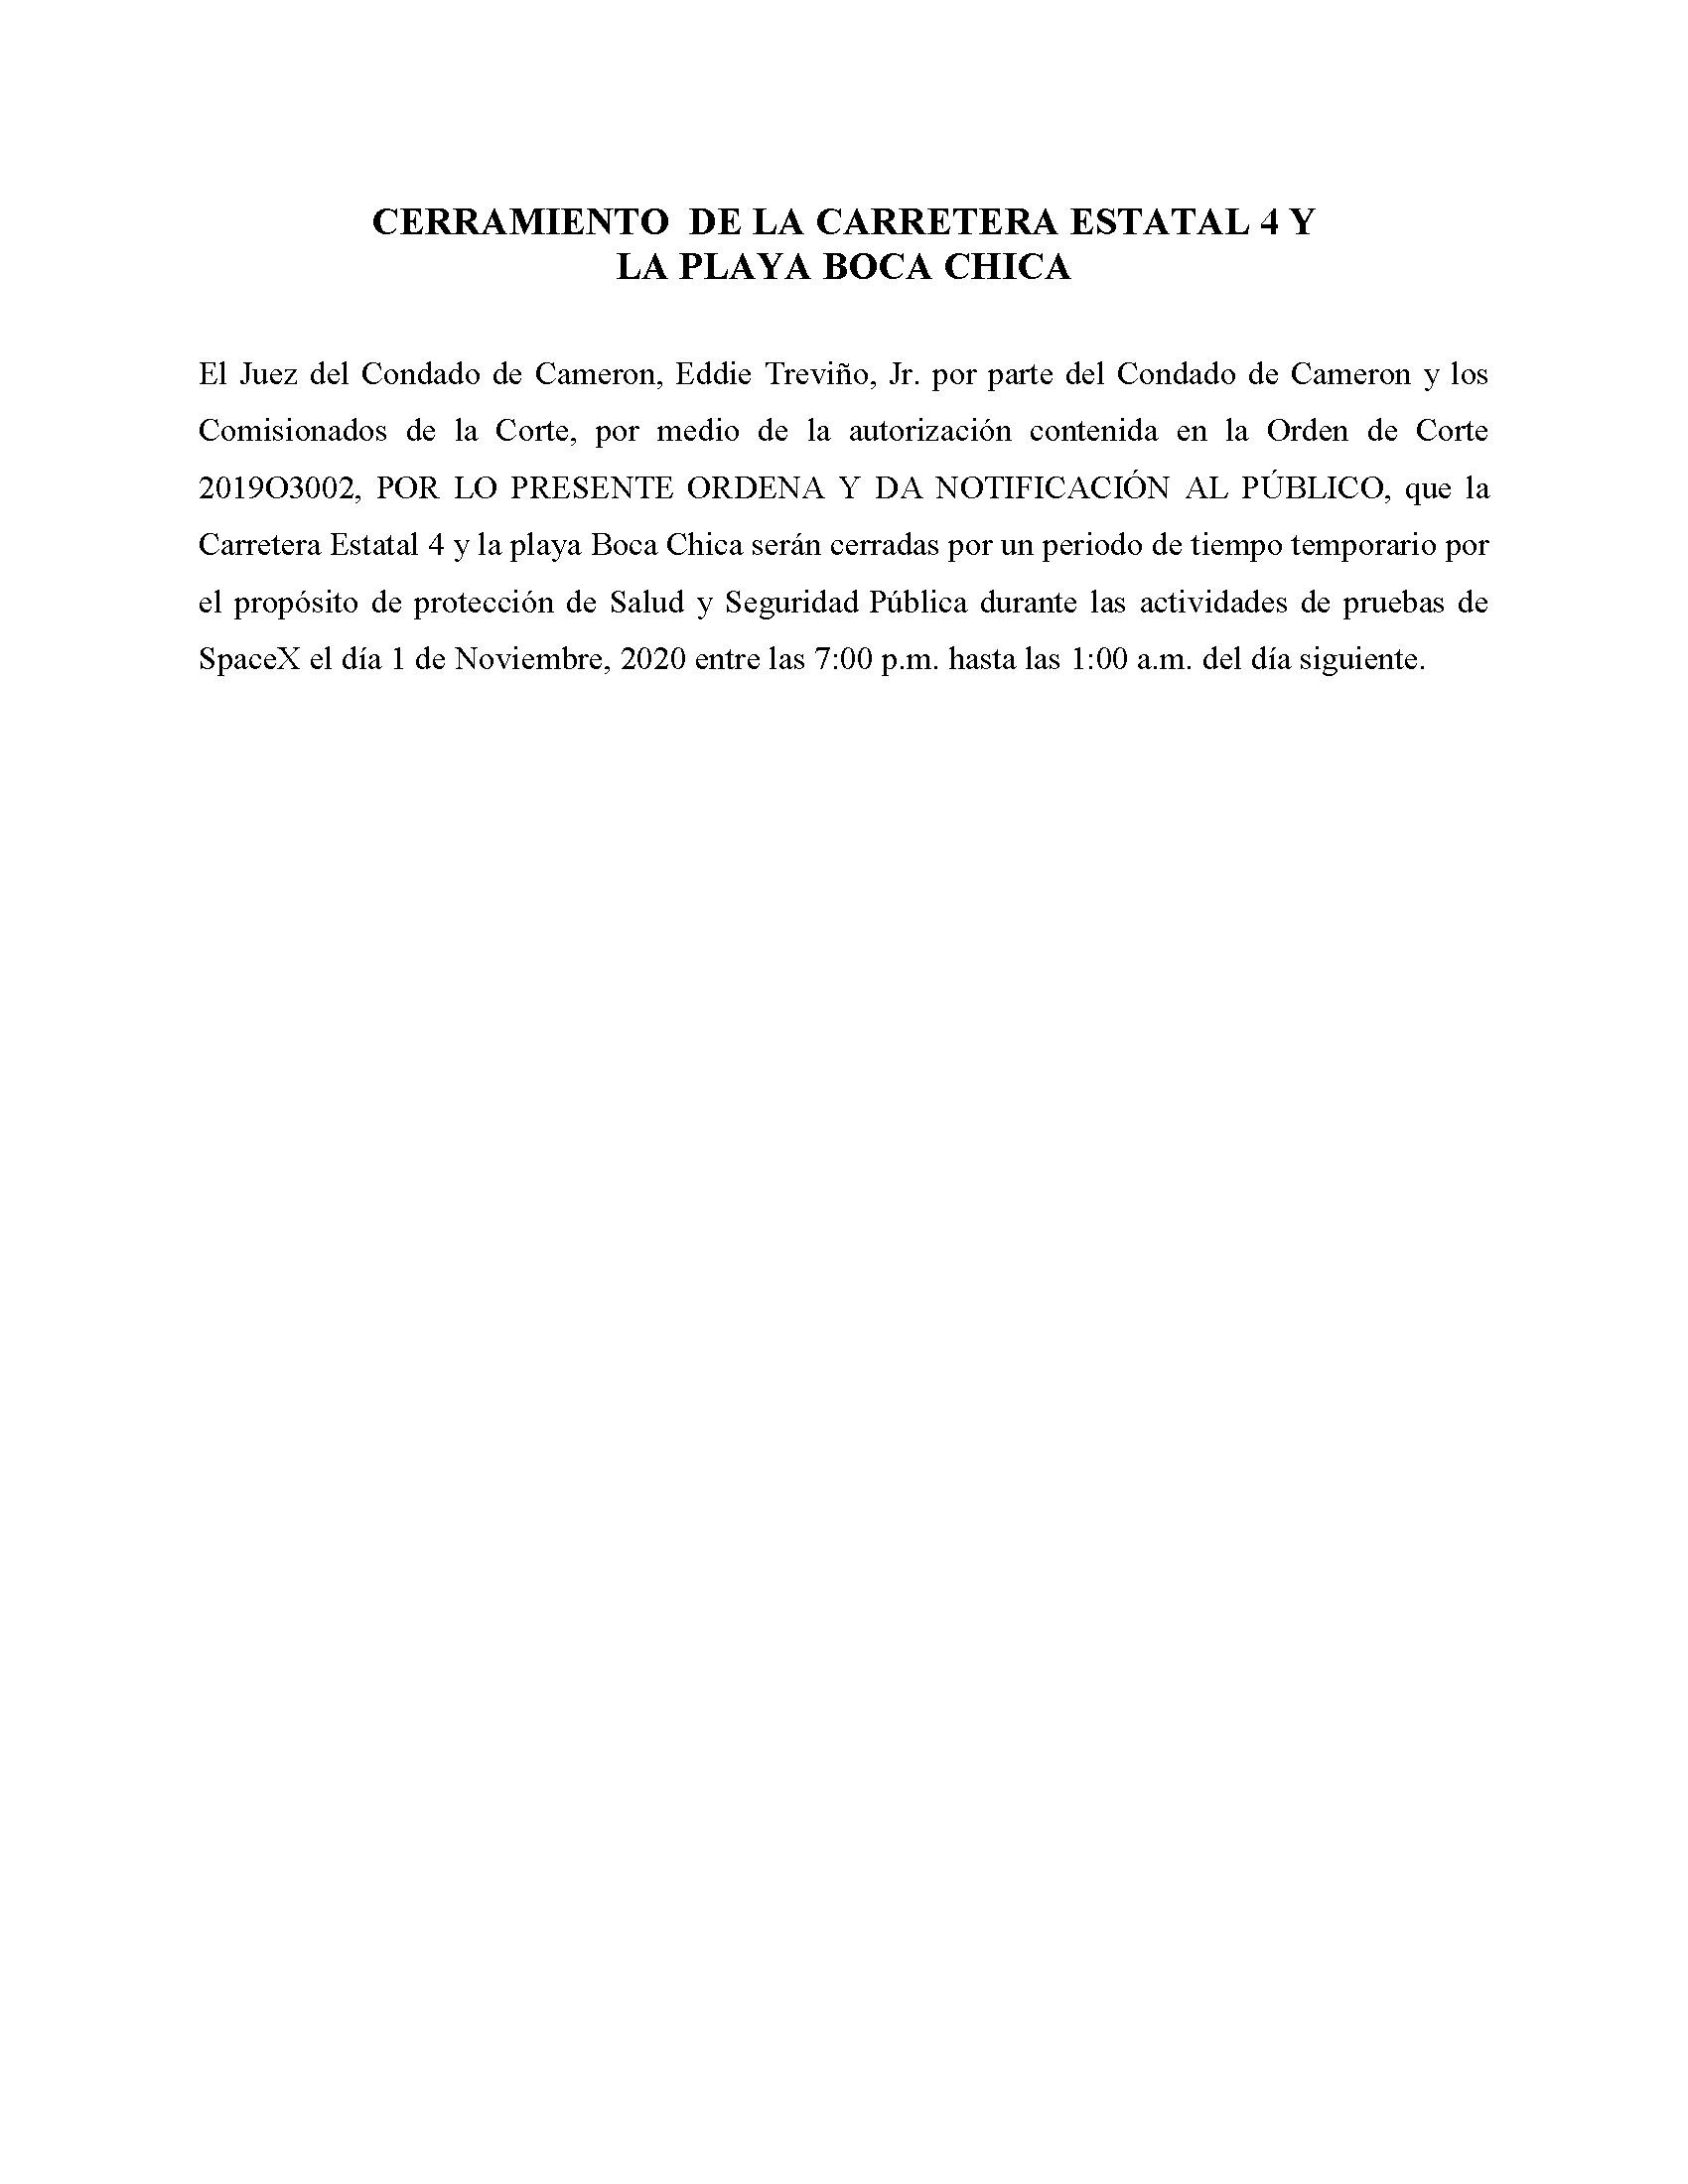 ORDER.CLOSURE OF HIGHWAY 4 Y LA PLAYA BOCA CHICA.SPANISH.11.01.20